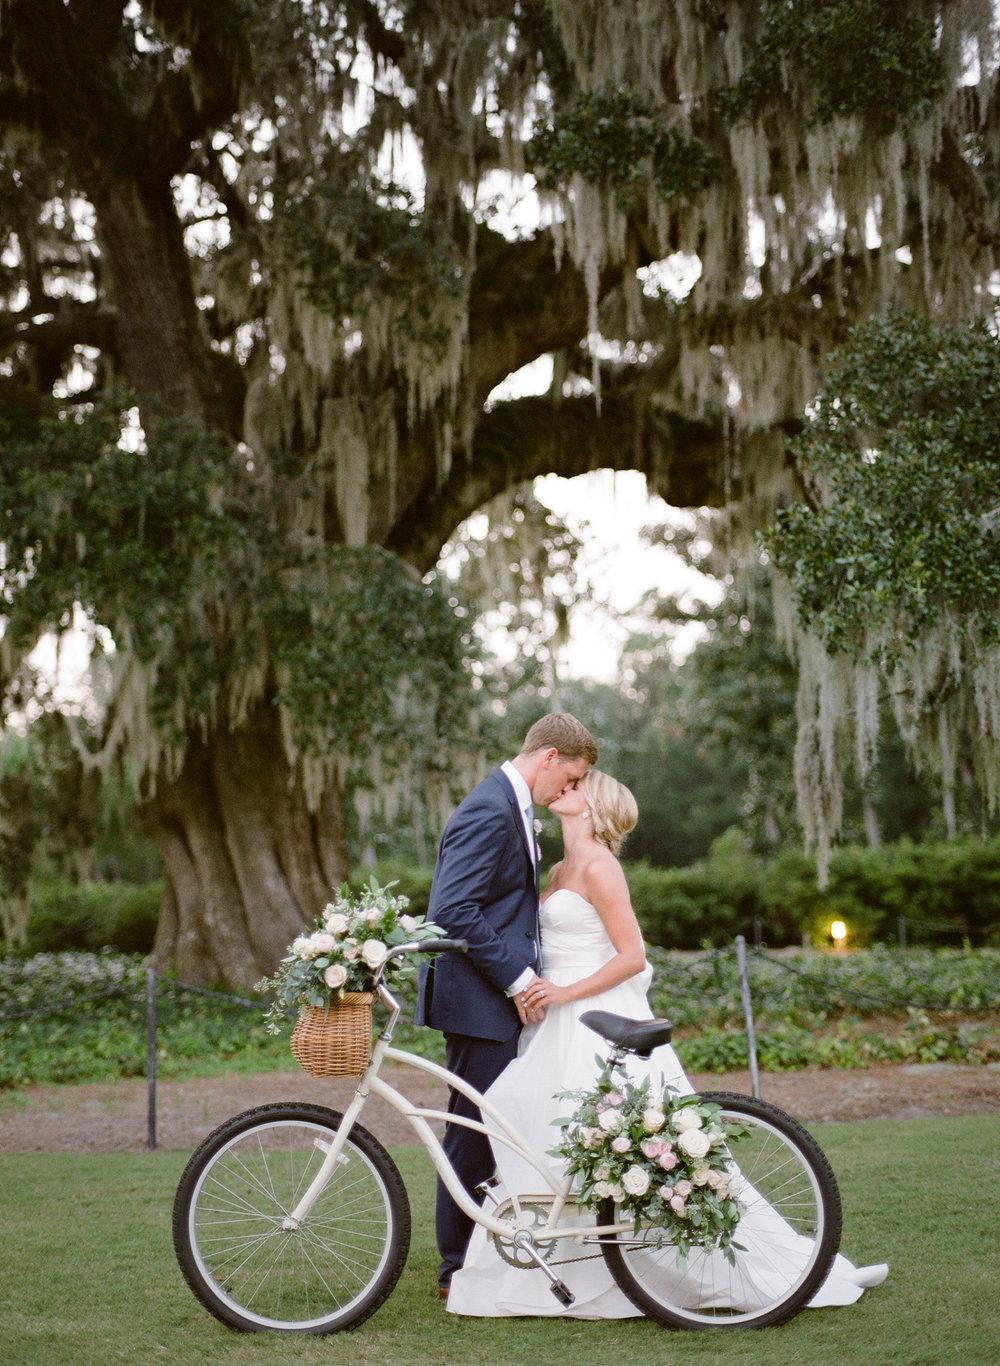 Airlie-Gardens-Wedding-54.jpg